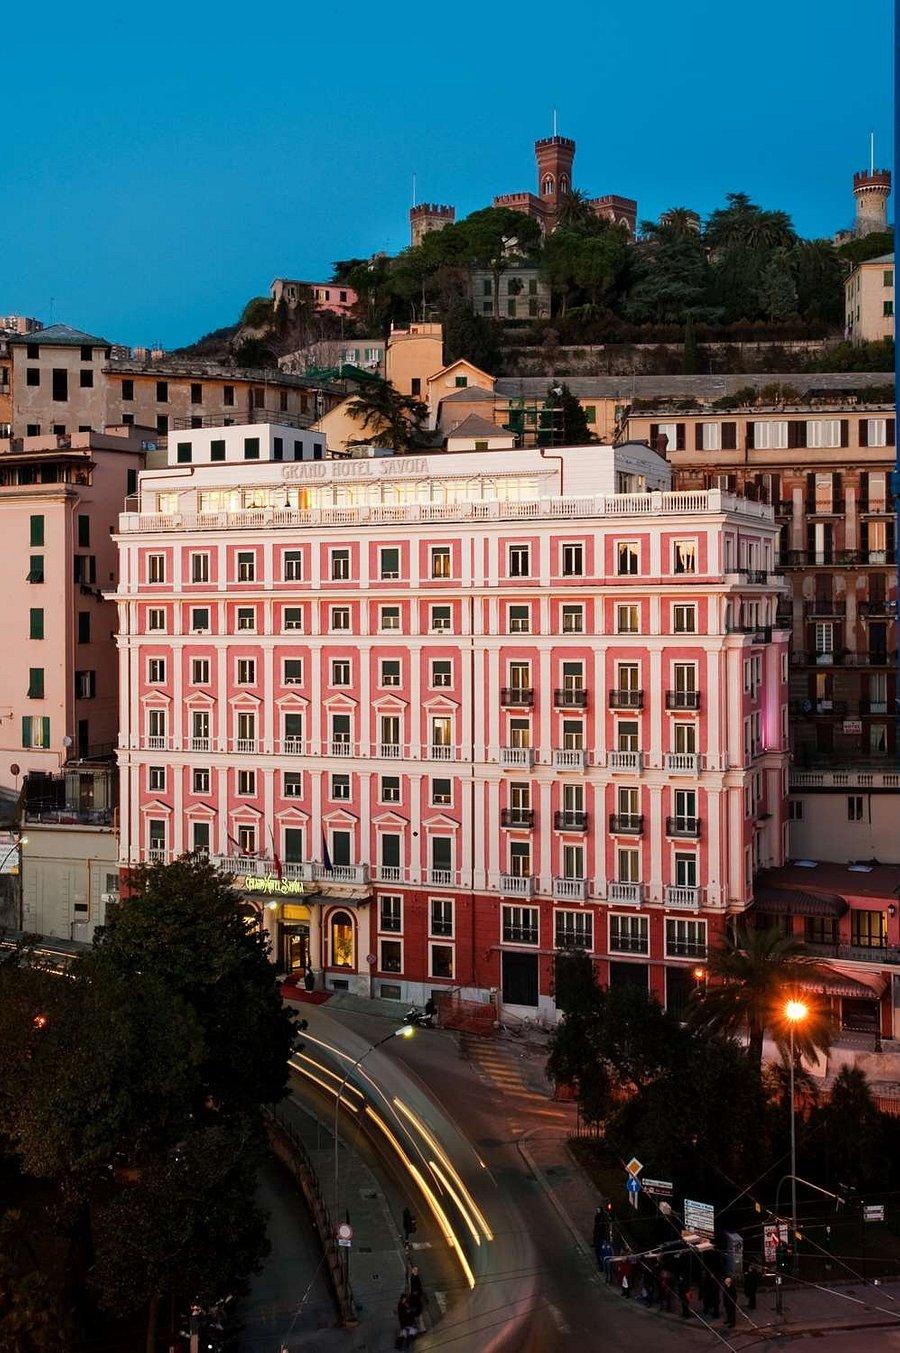 Grand Hotel Savoia Ab 105 1 5 2 Bewertungen Fotos Preisvergleich Genua Italien Ligurien Tripadvisor